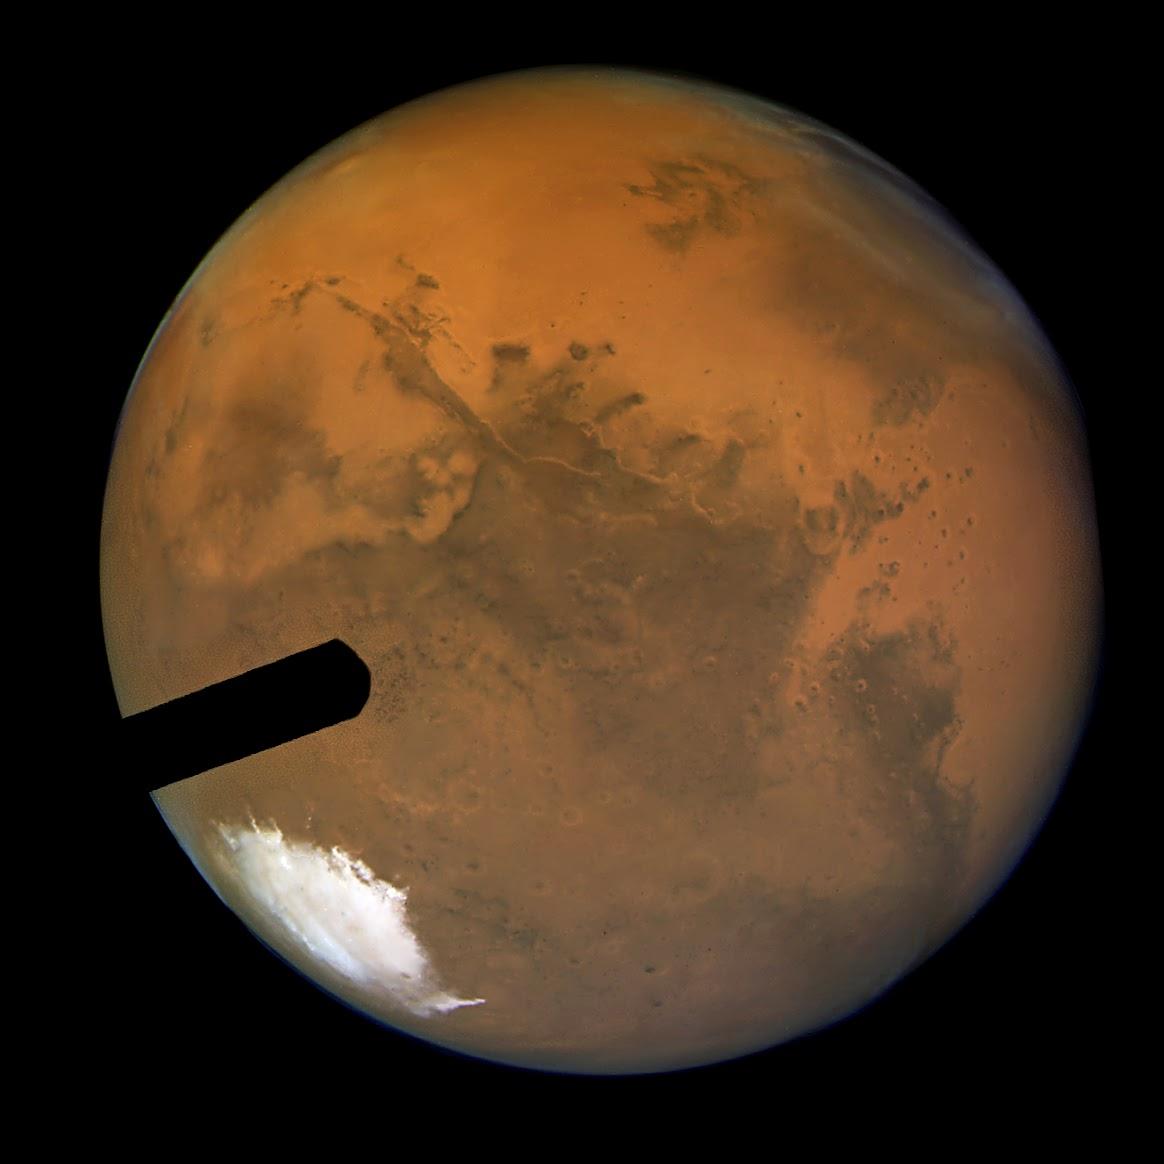 Mars Hubble Telescope Hubble Image of Mars